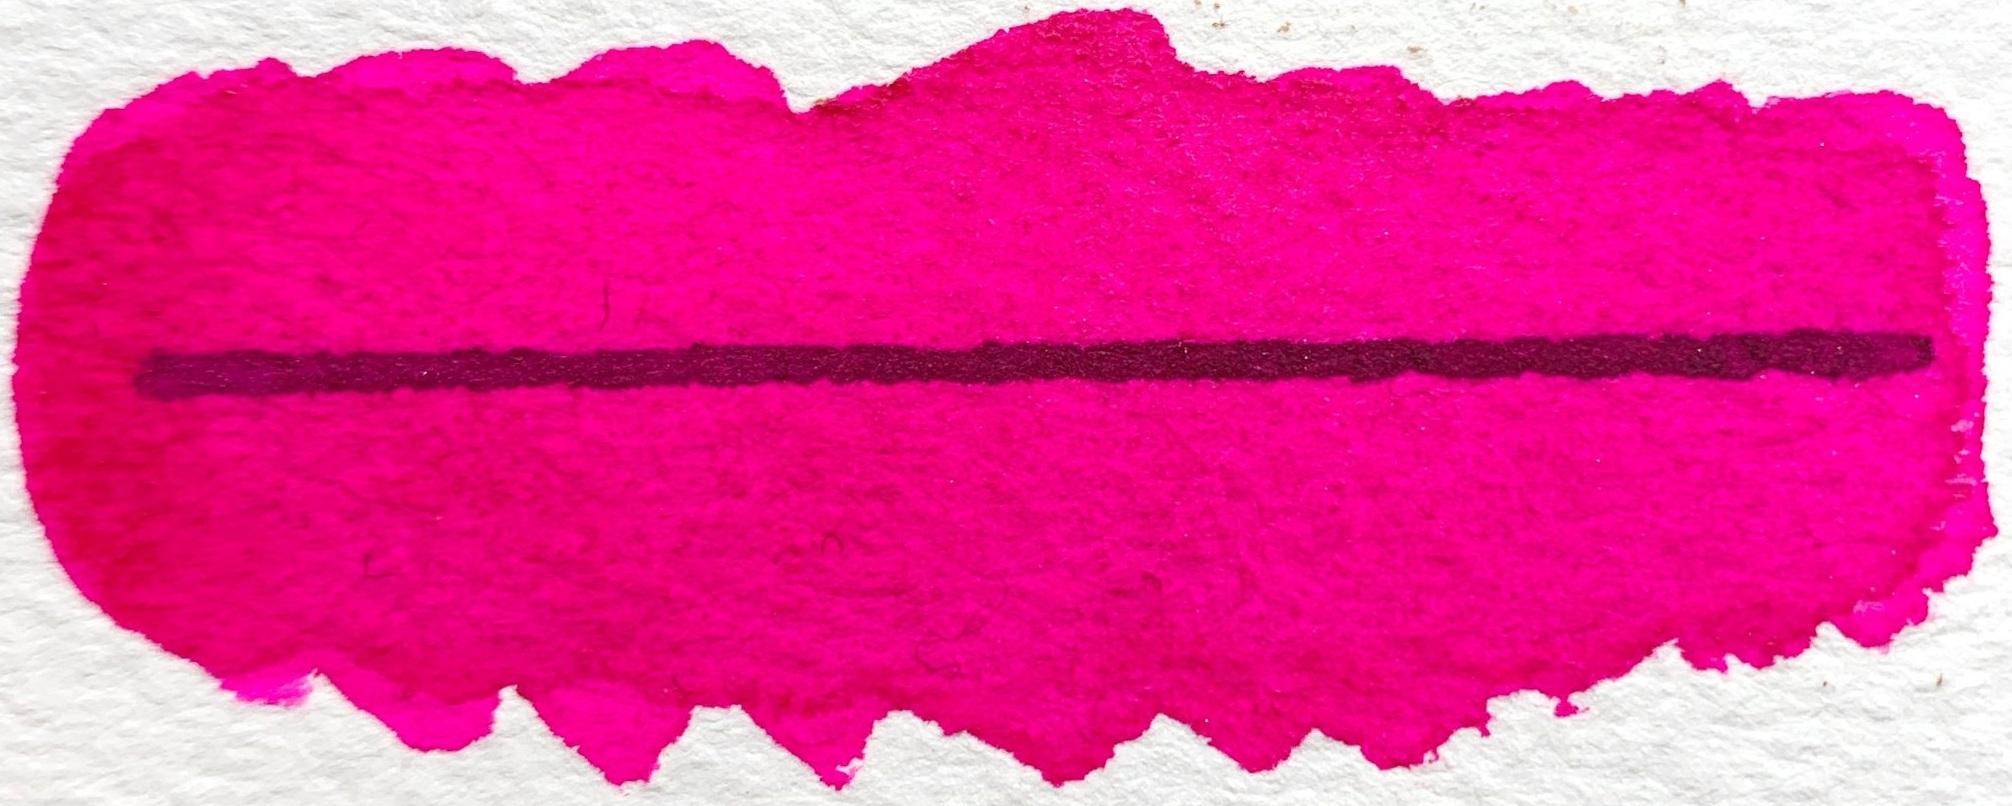 Sweetheart - PV15, PR28, opaque, lightfast, staining, neon